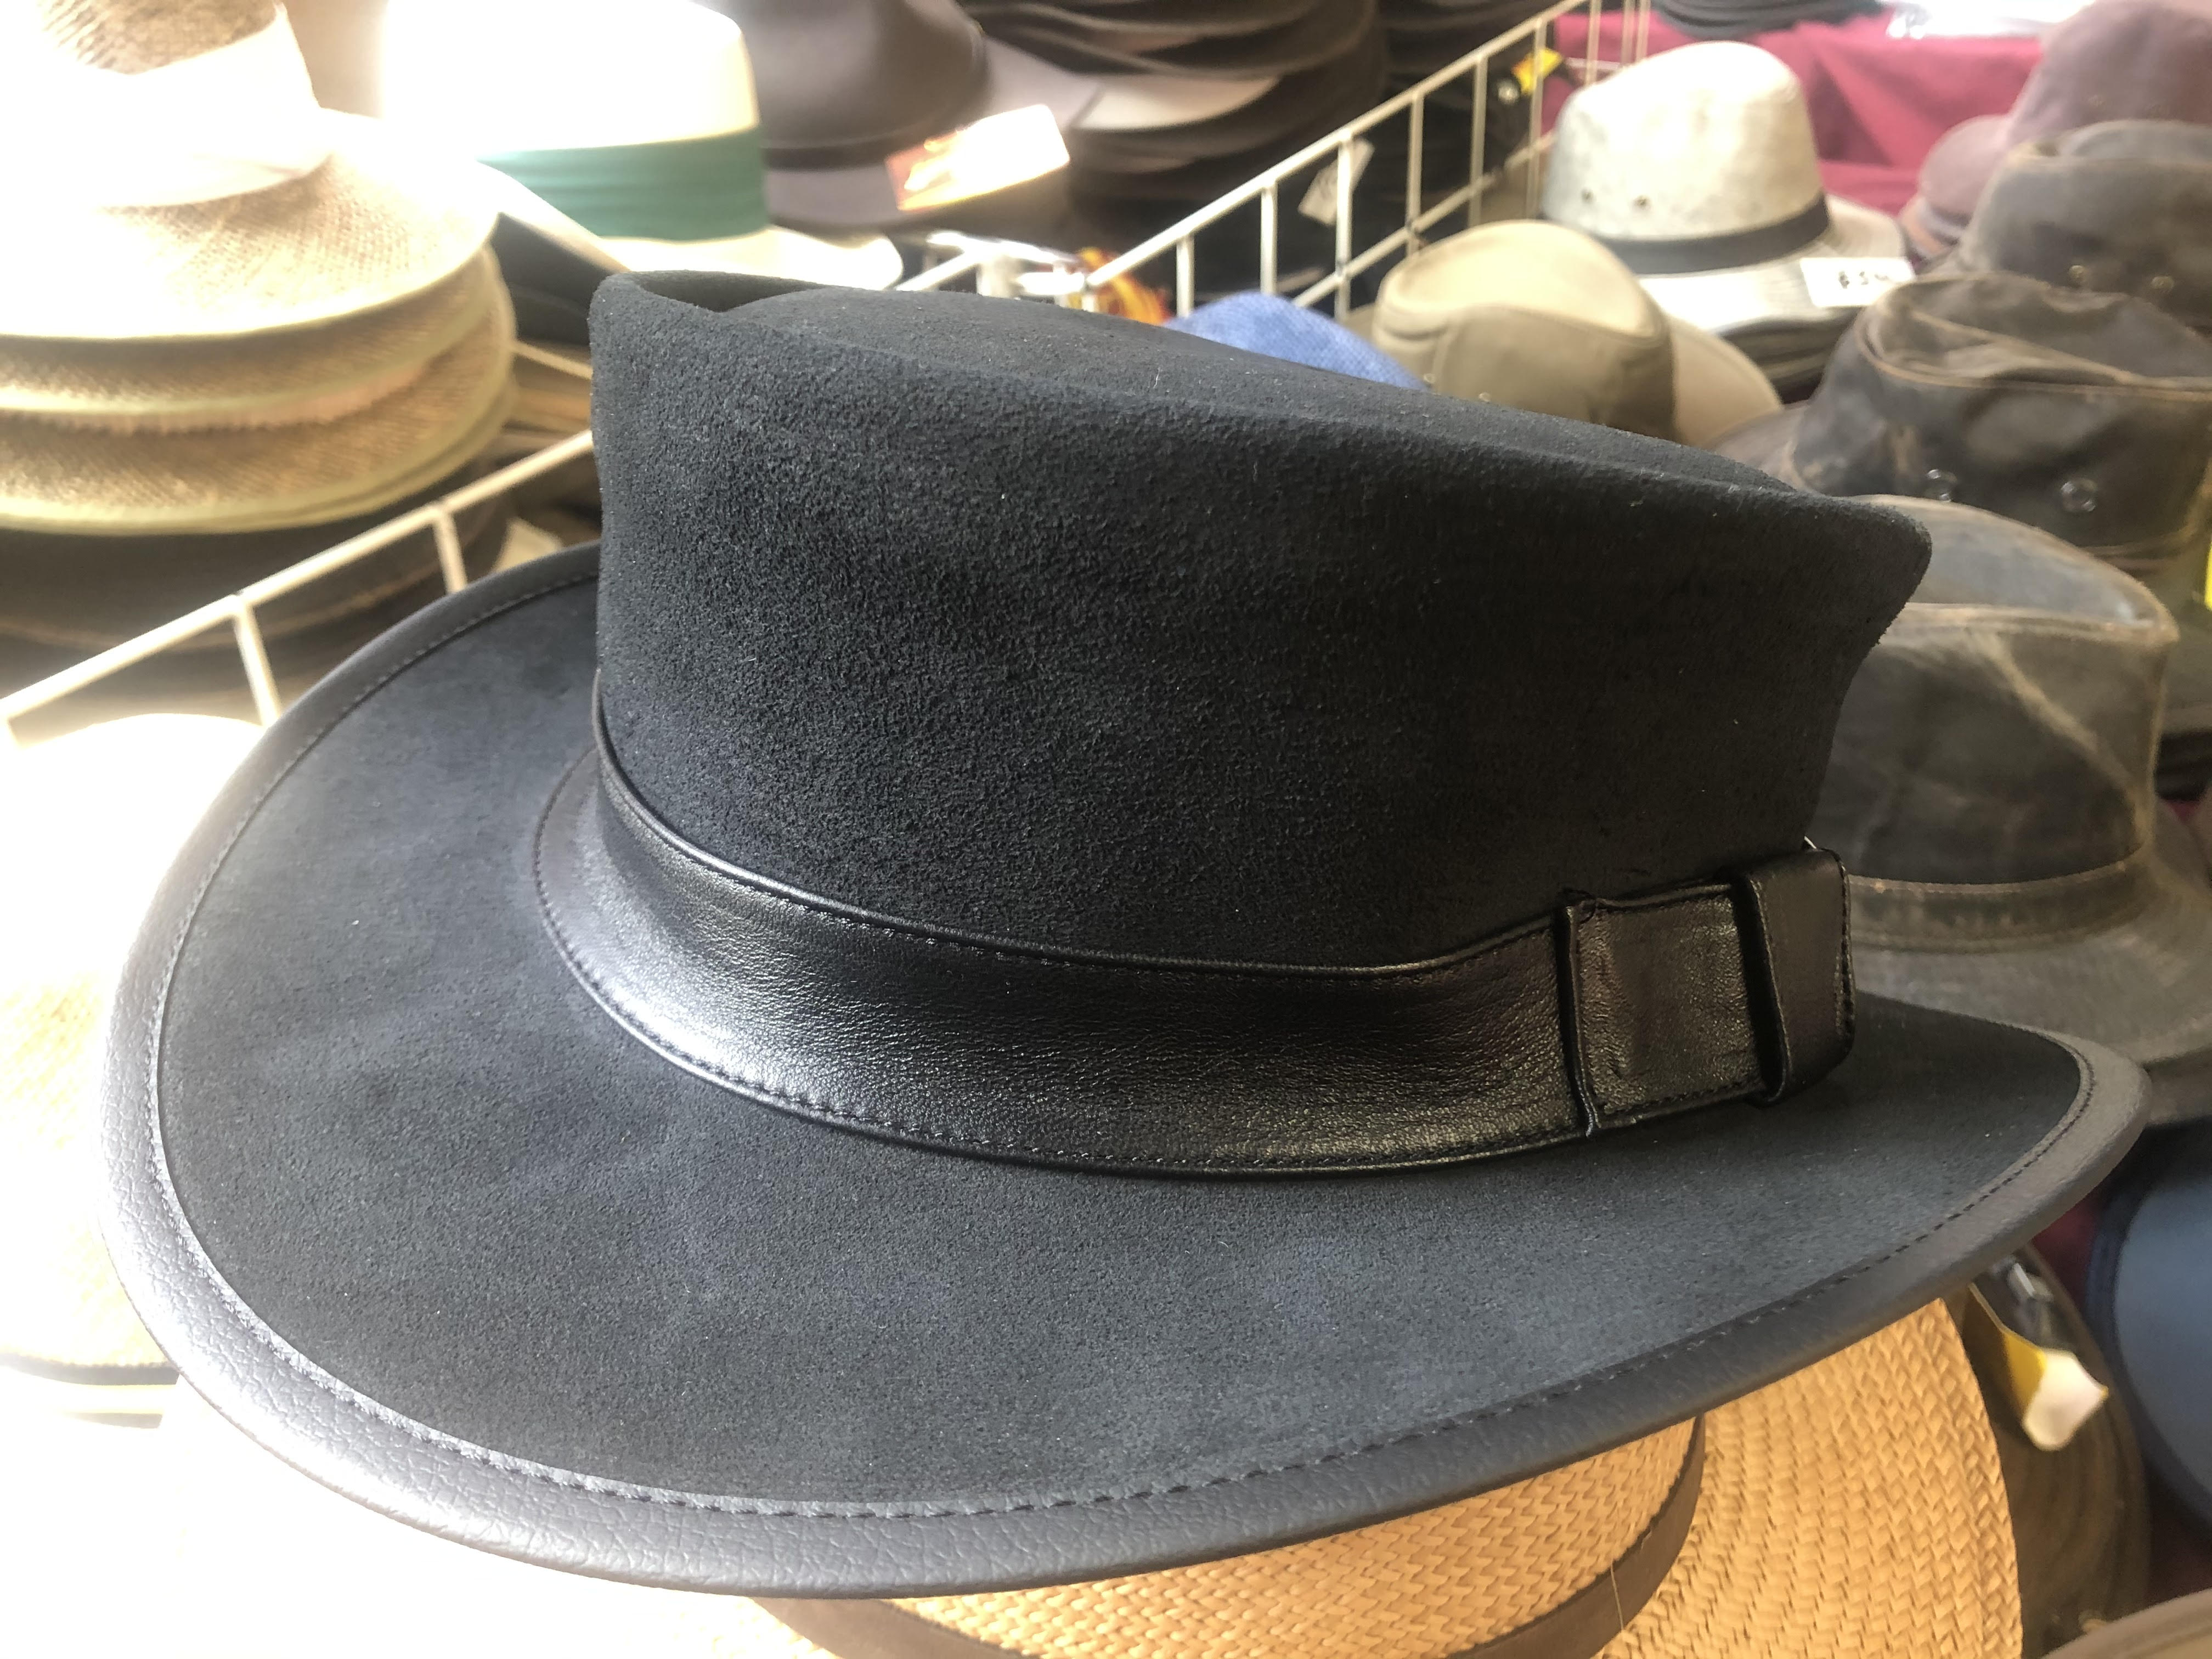 Unique screenwriting explained using this hat.